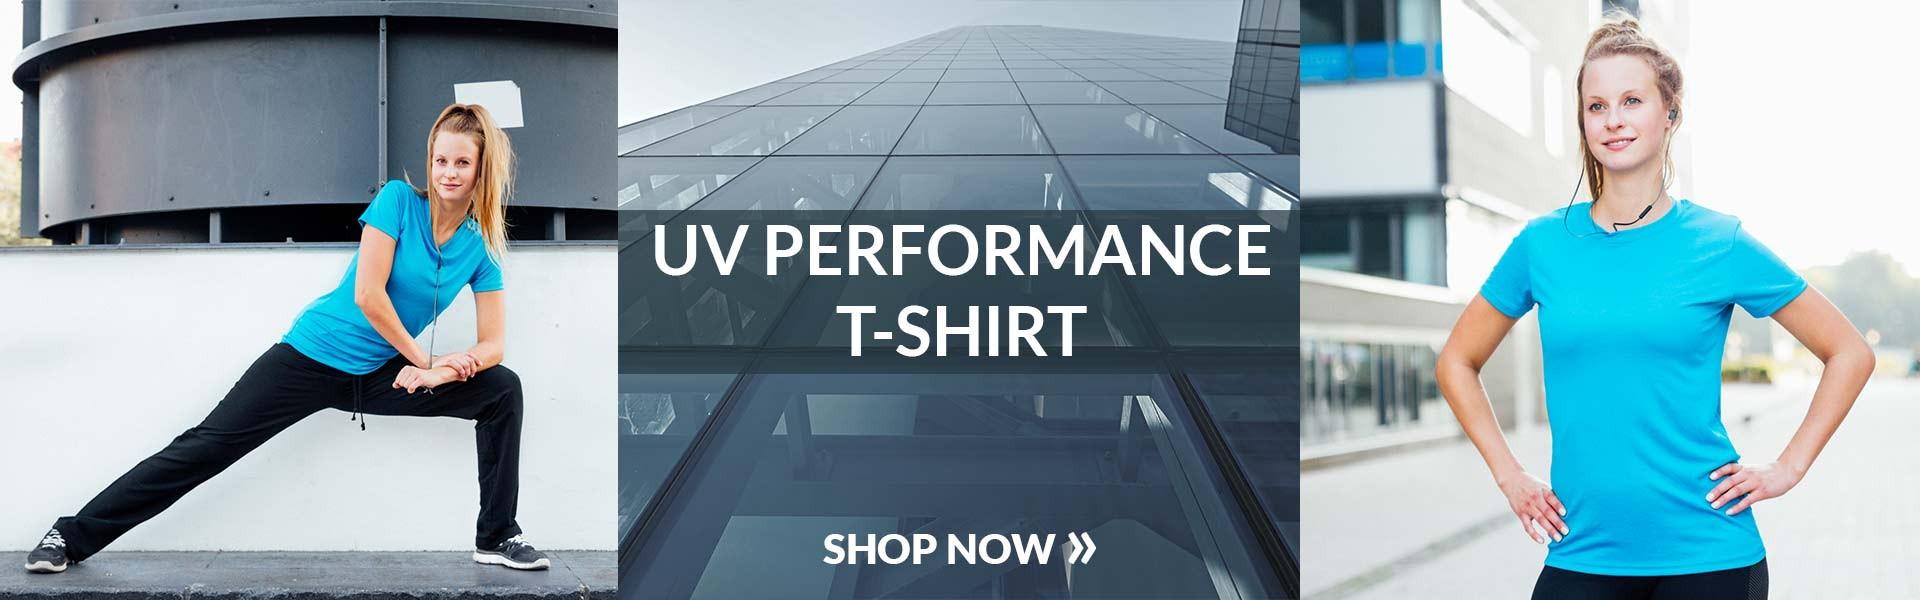 Uv Women's Performance T-shirt